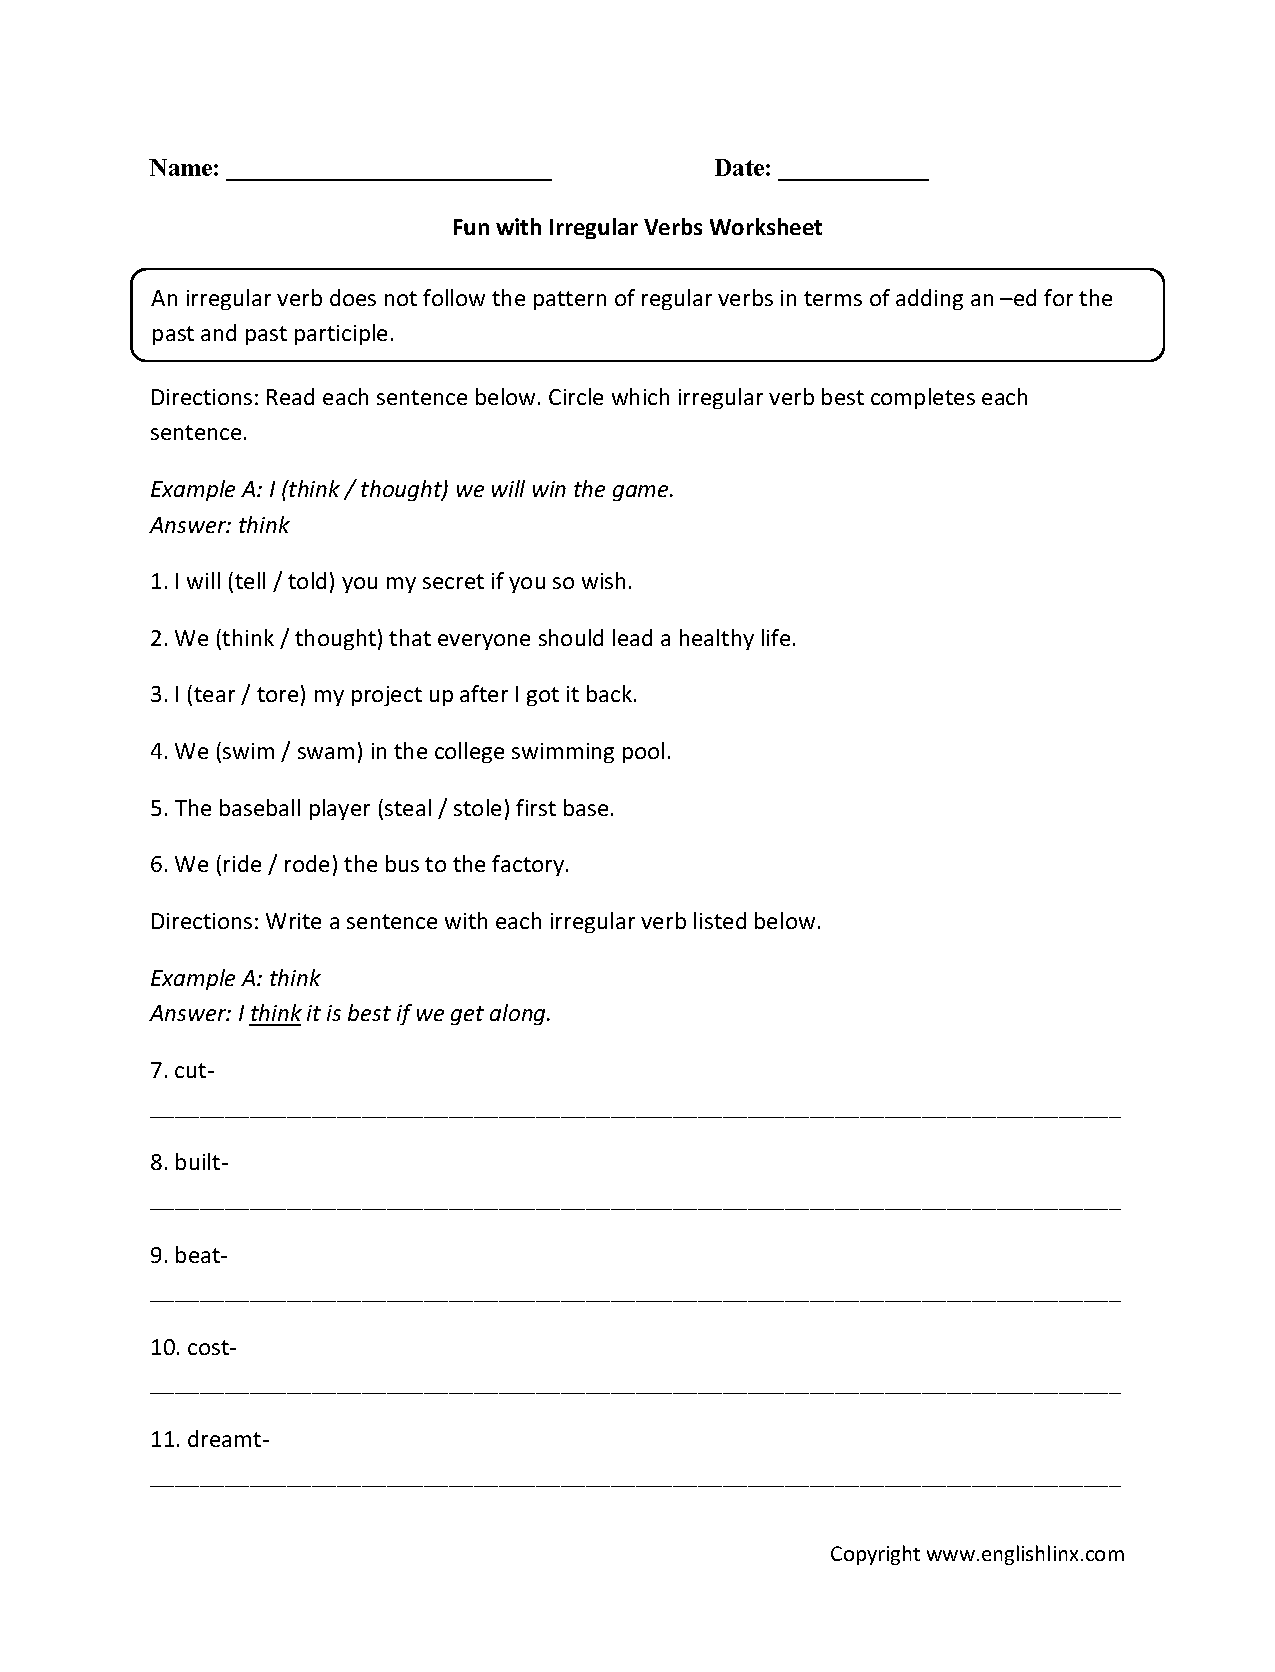 Worksheets Fun Grammar Worksheets fun with irregular verbs worksheets grammar worksheet worksheets